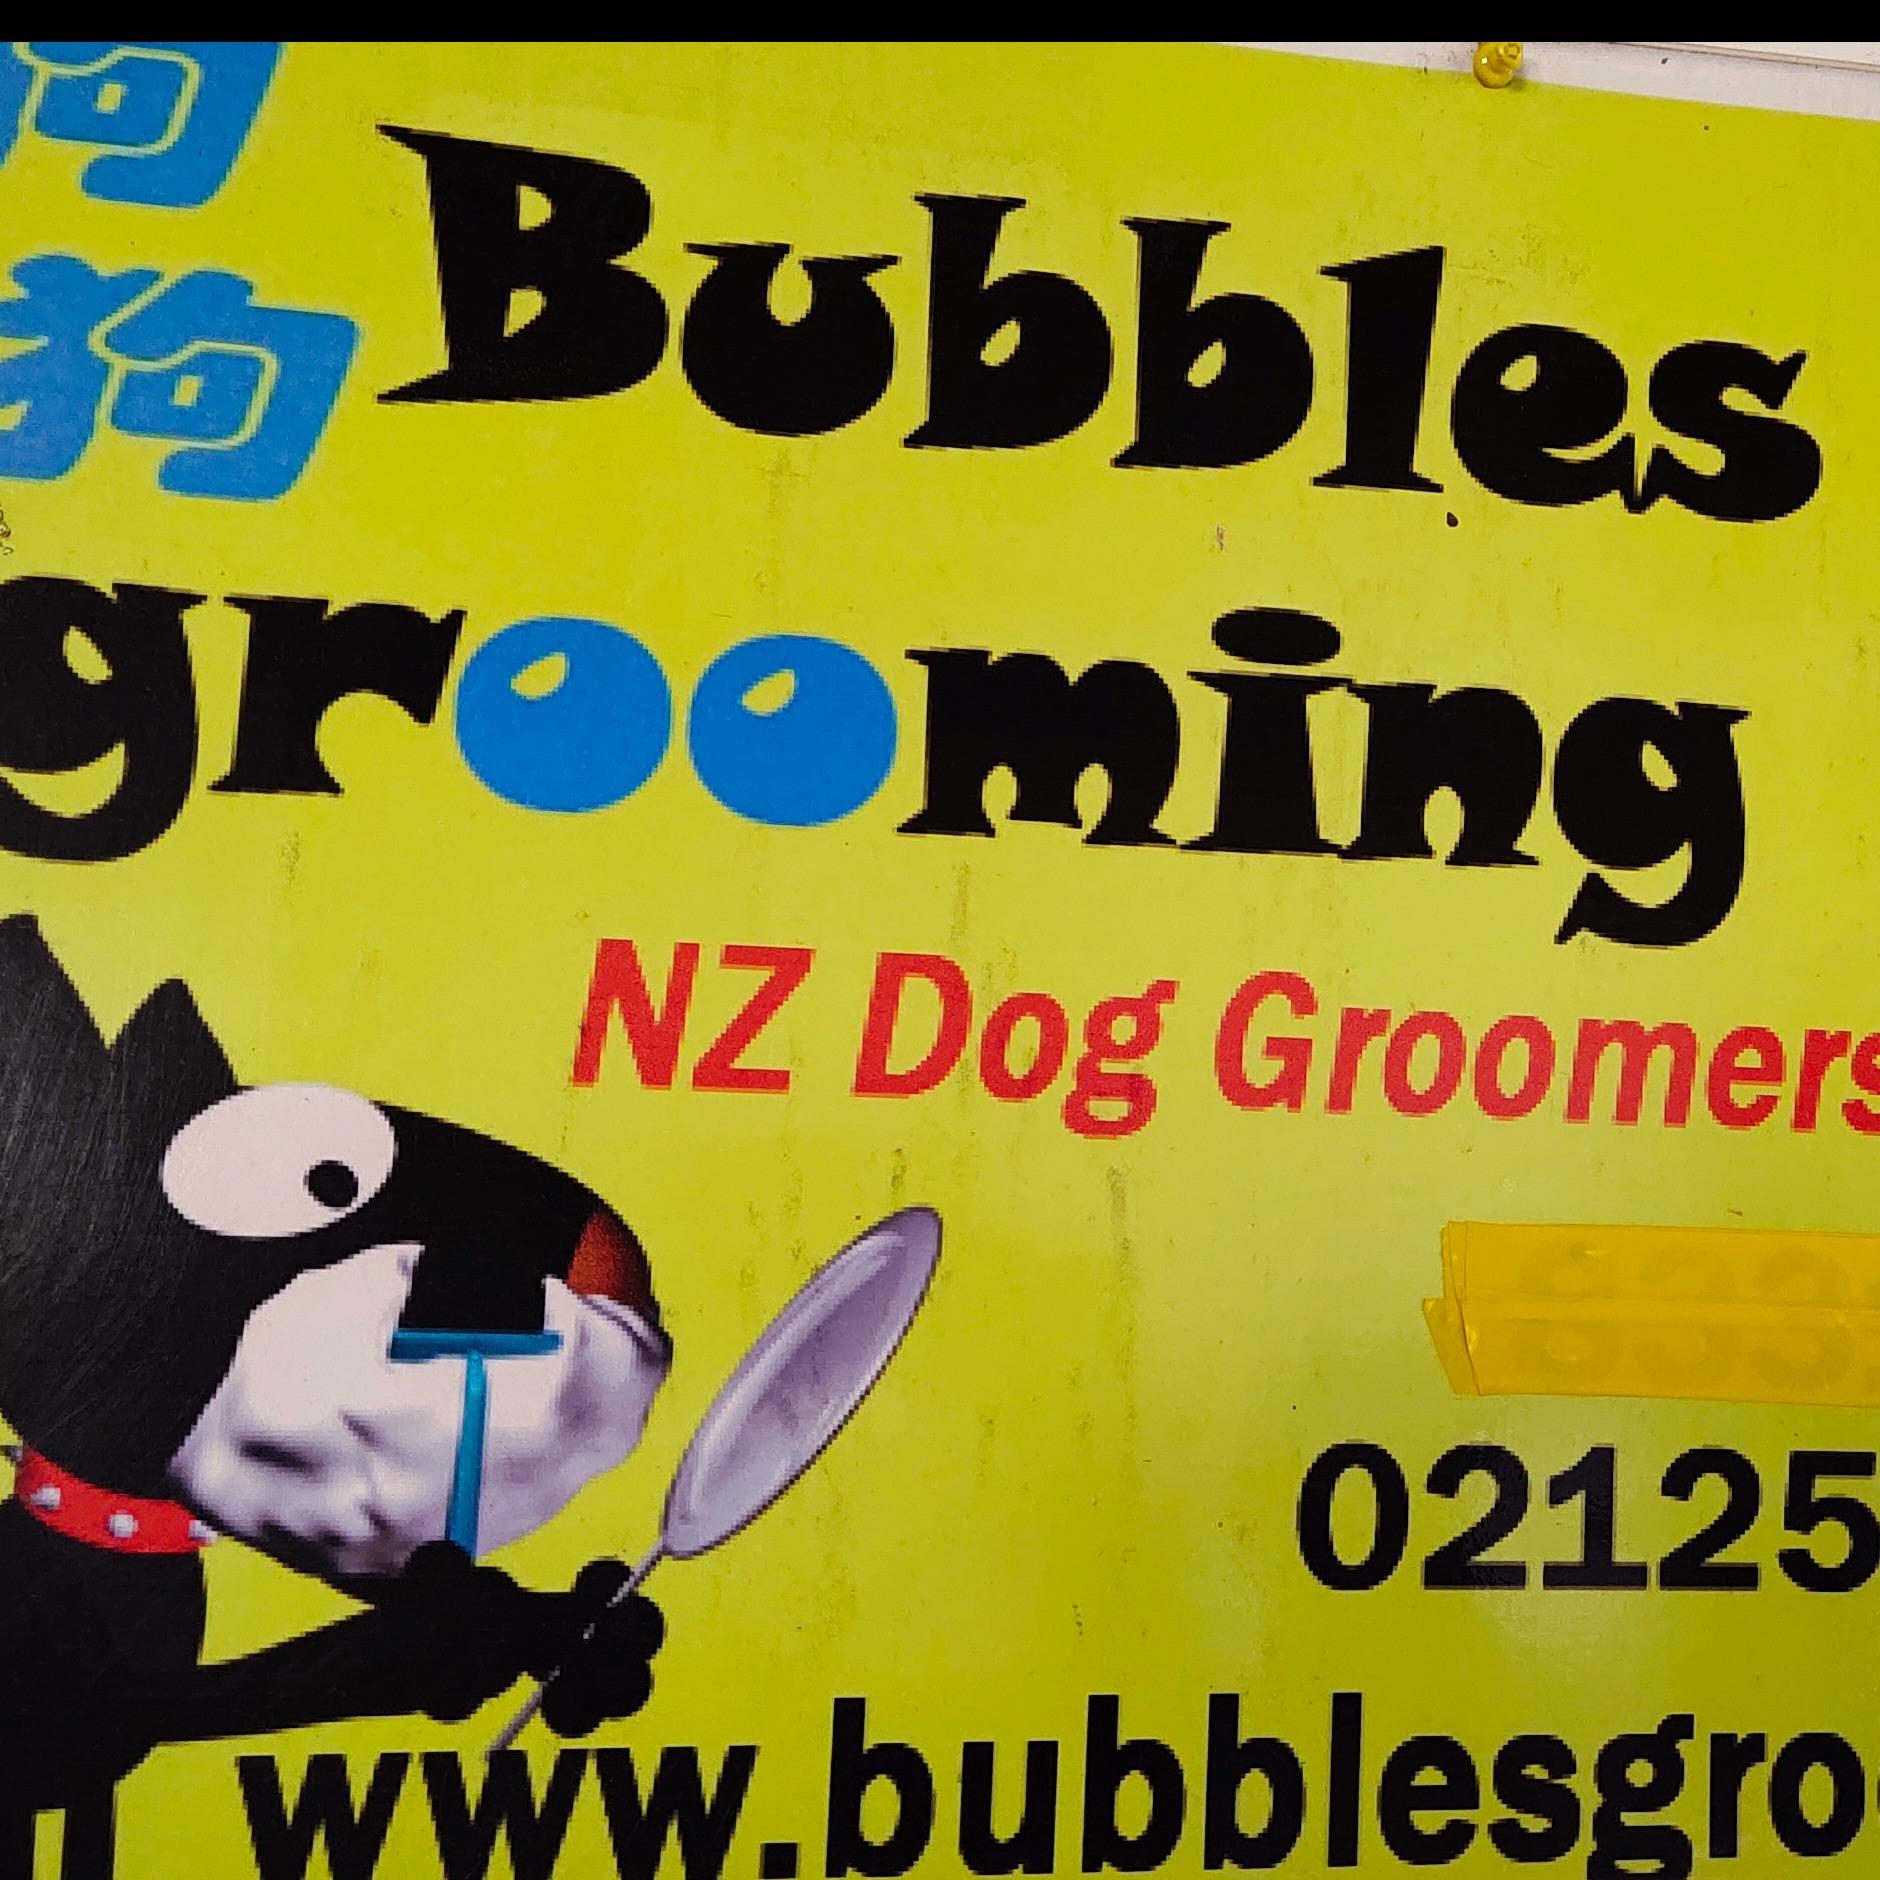 Bubbles Dog Grooming Salon